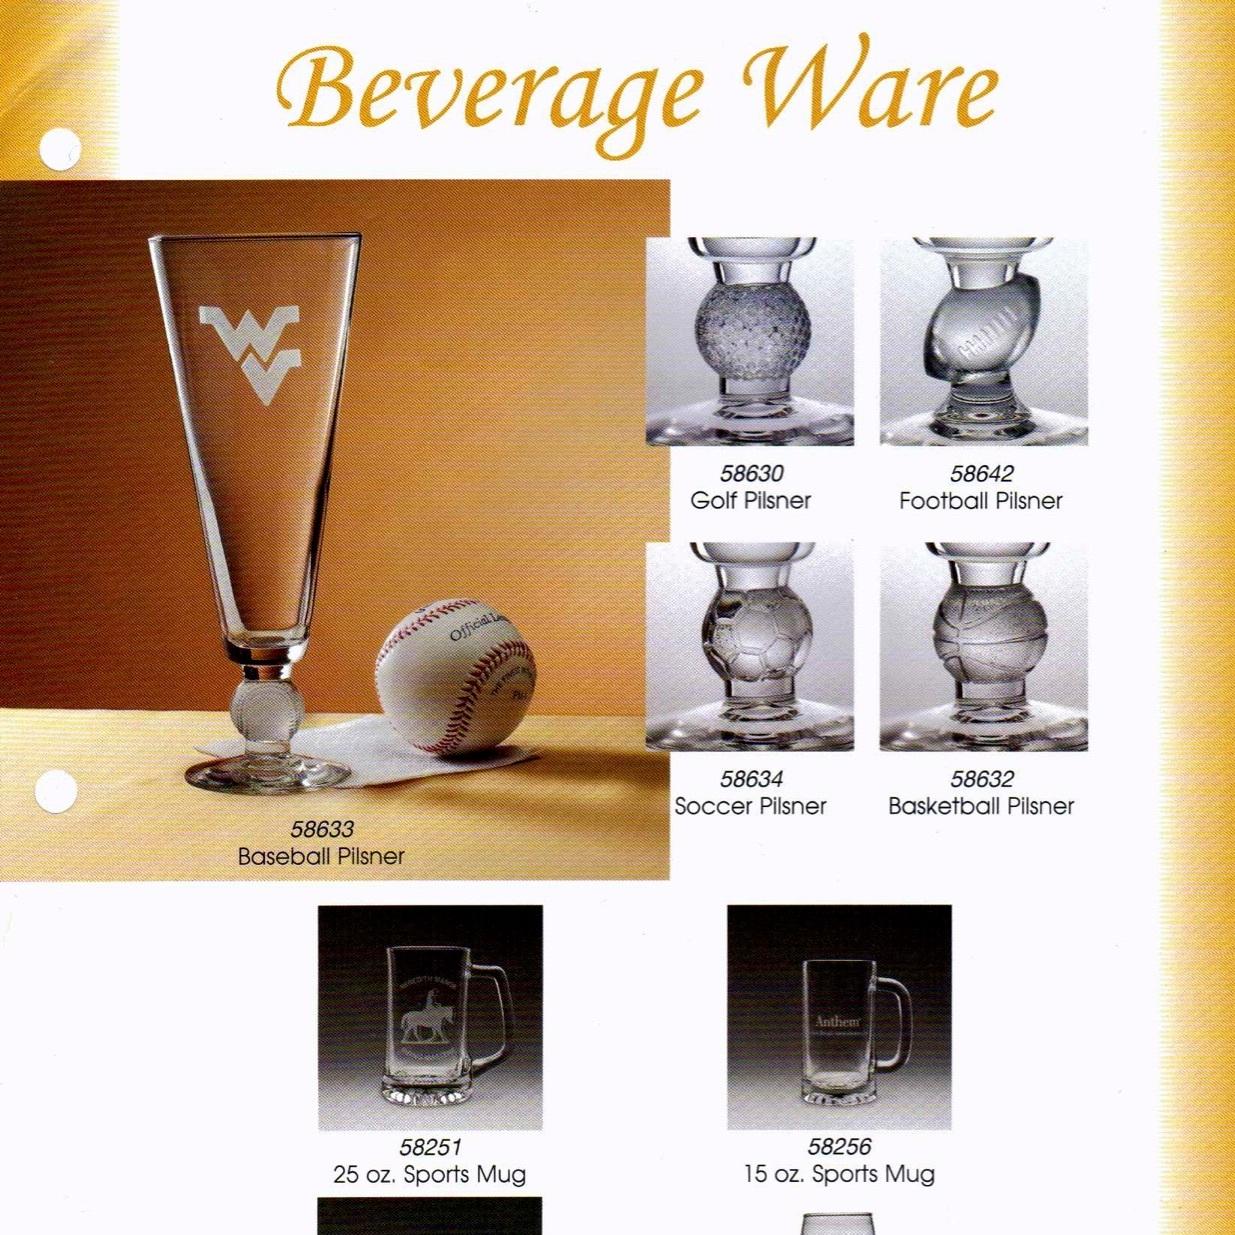 2005 Custom Beverage Ware